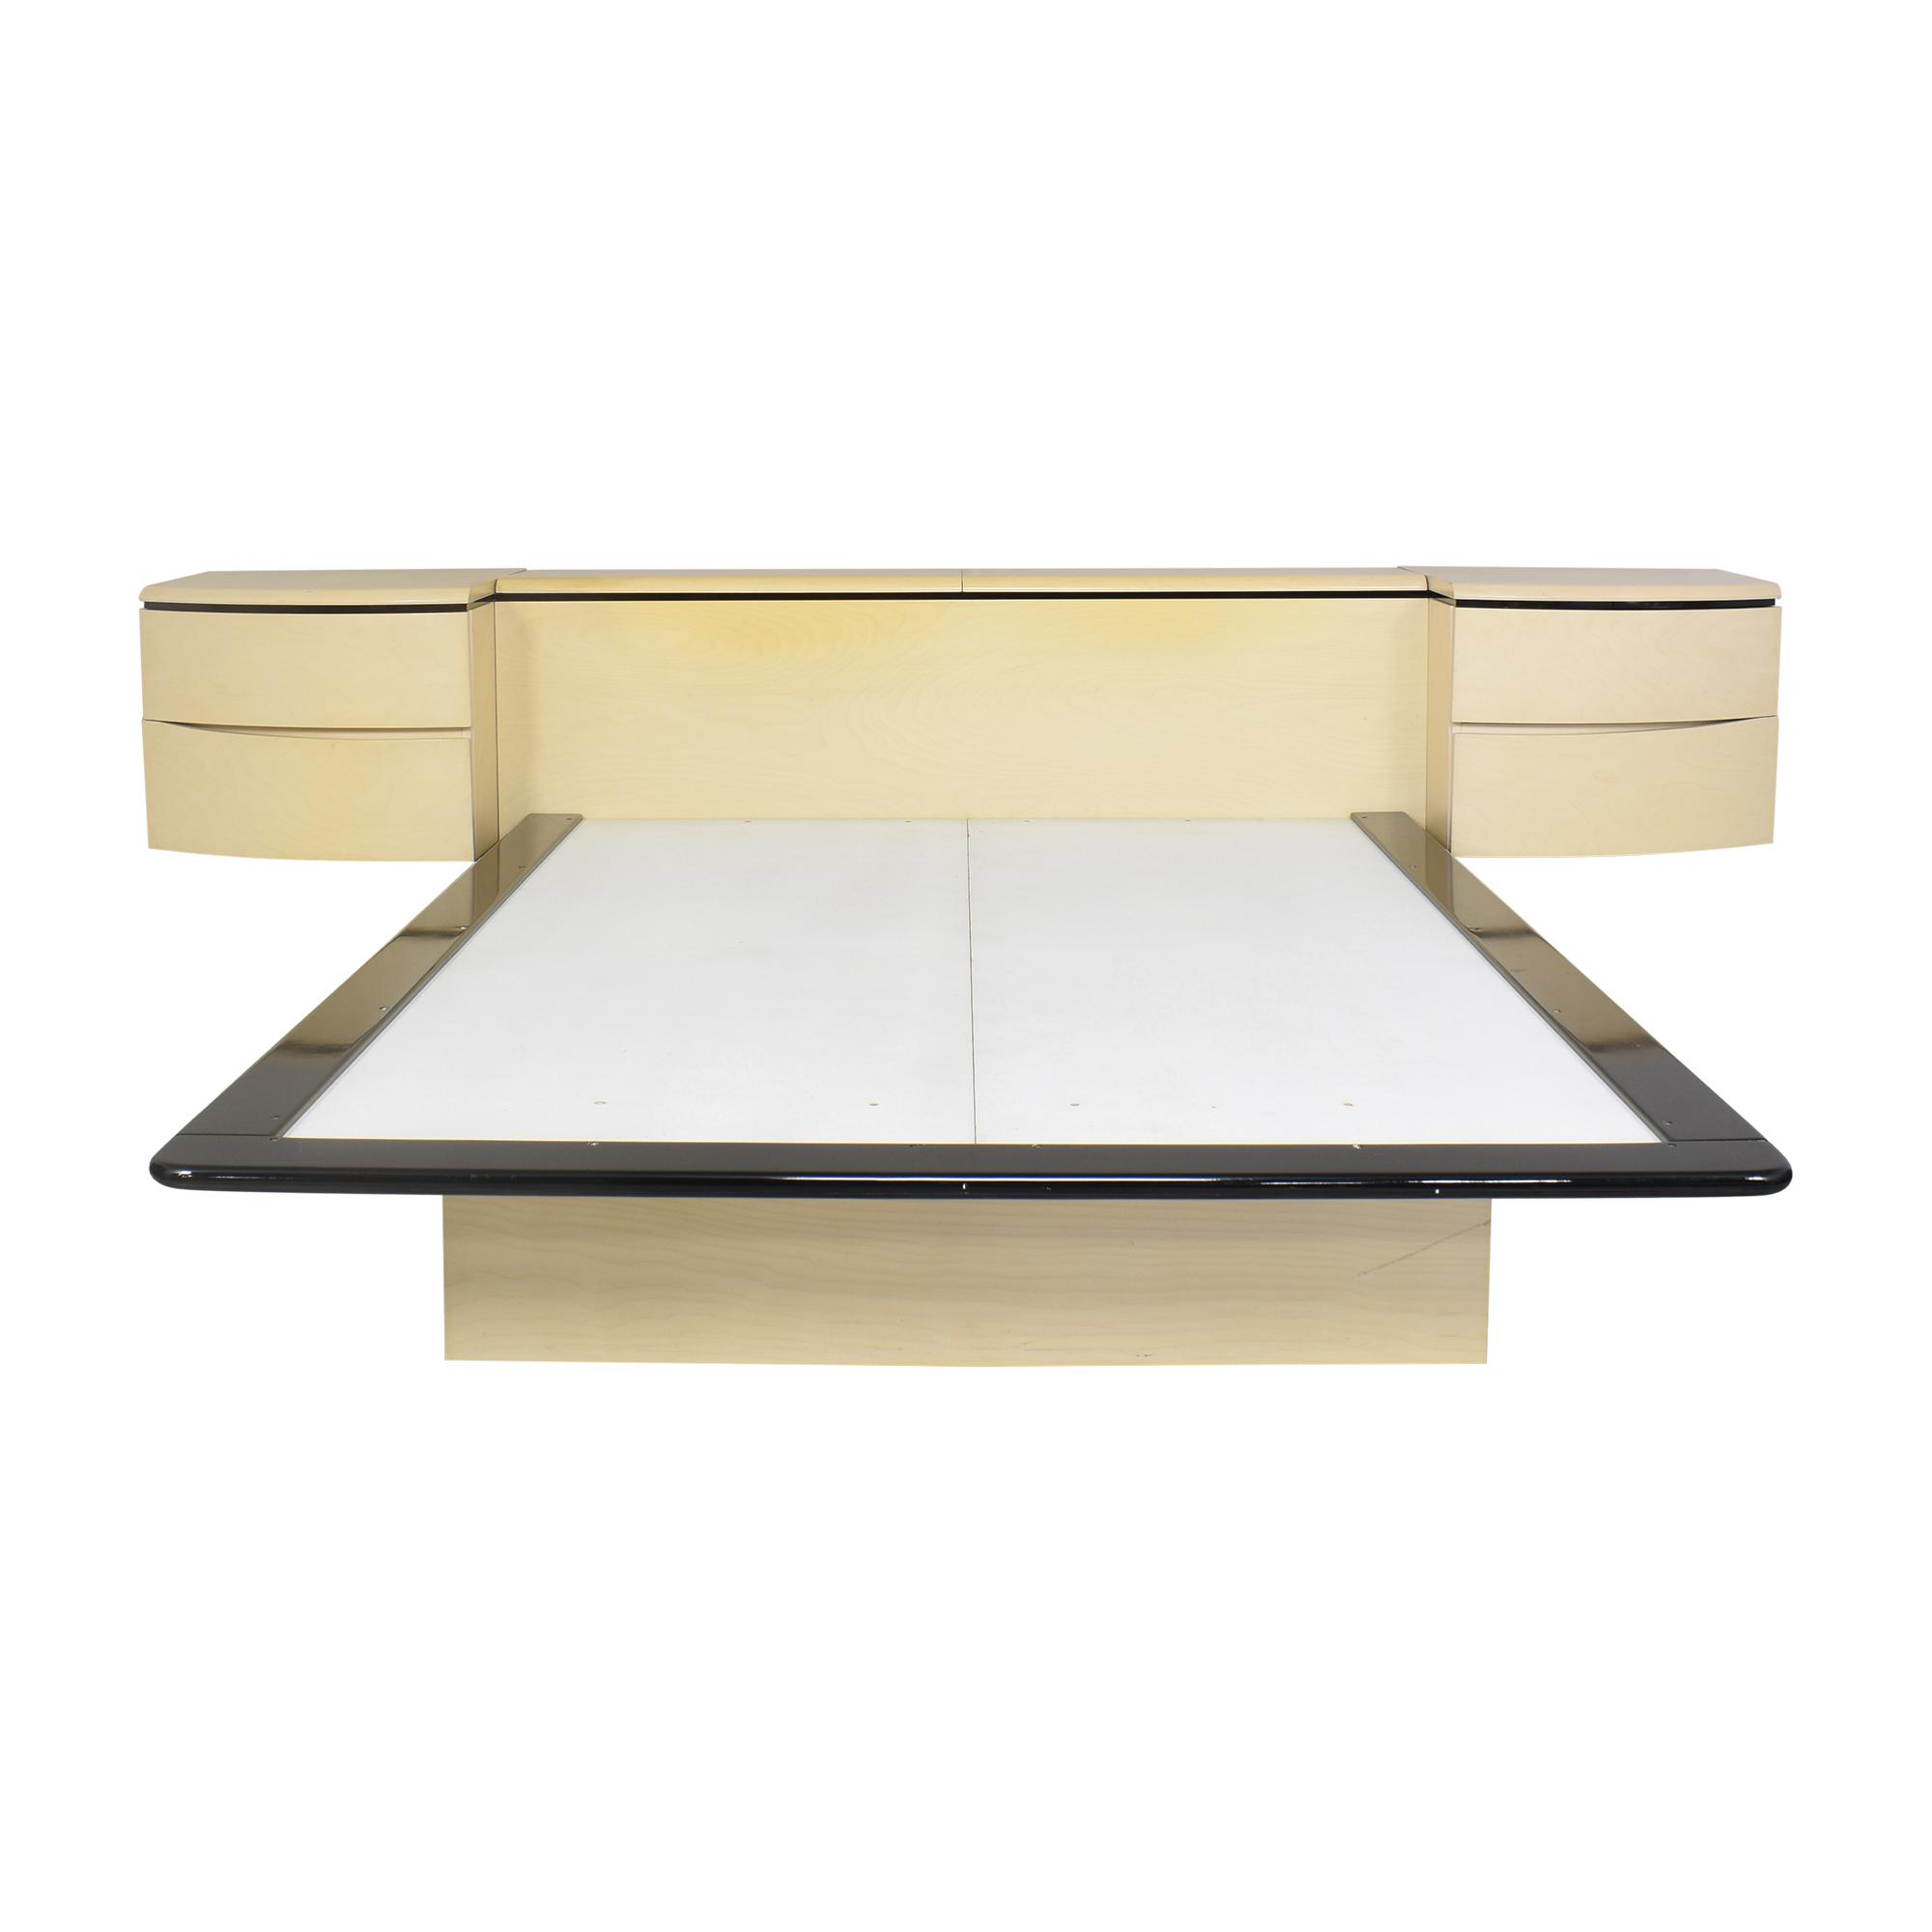 Modern Queen Platform Bed / Bed Frames